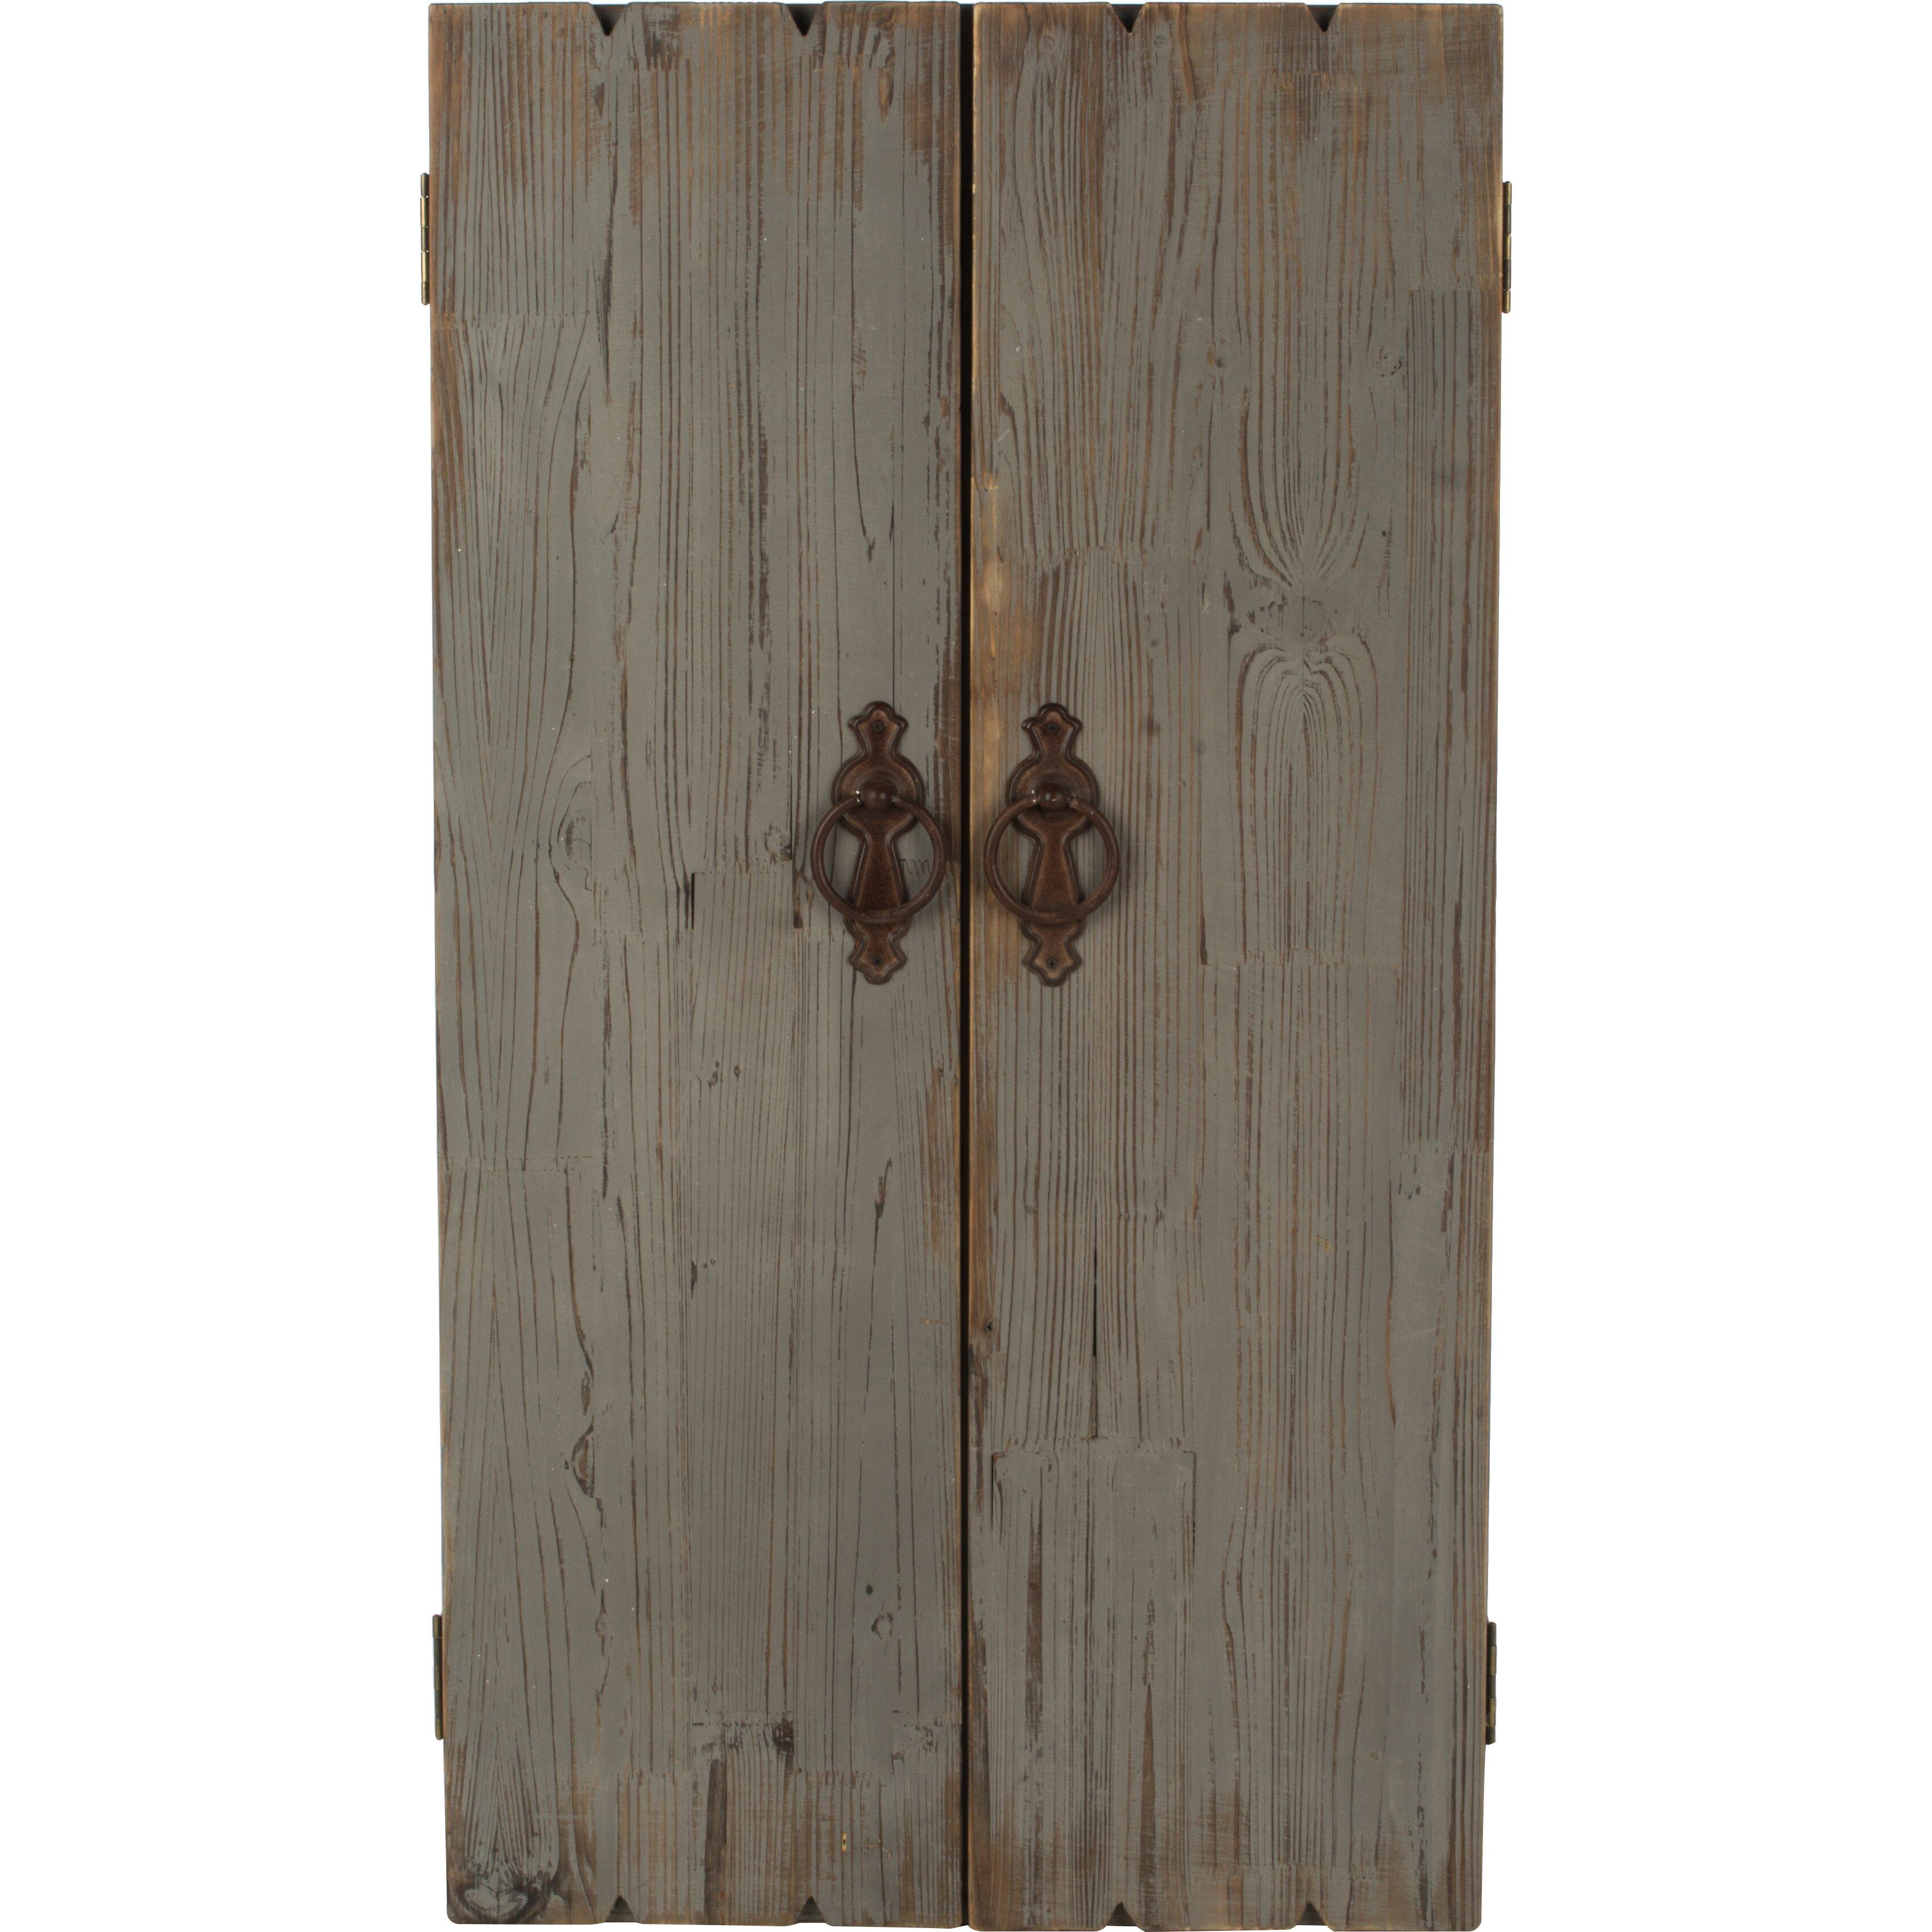 Wall Of Storage Cabinets Lark Manor Ilias Wooden Wall Storage Cabinet Reviews Wayfair